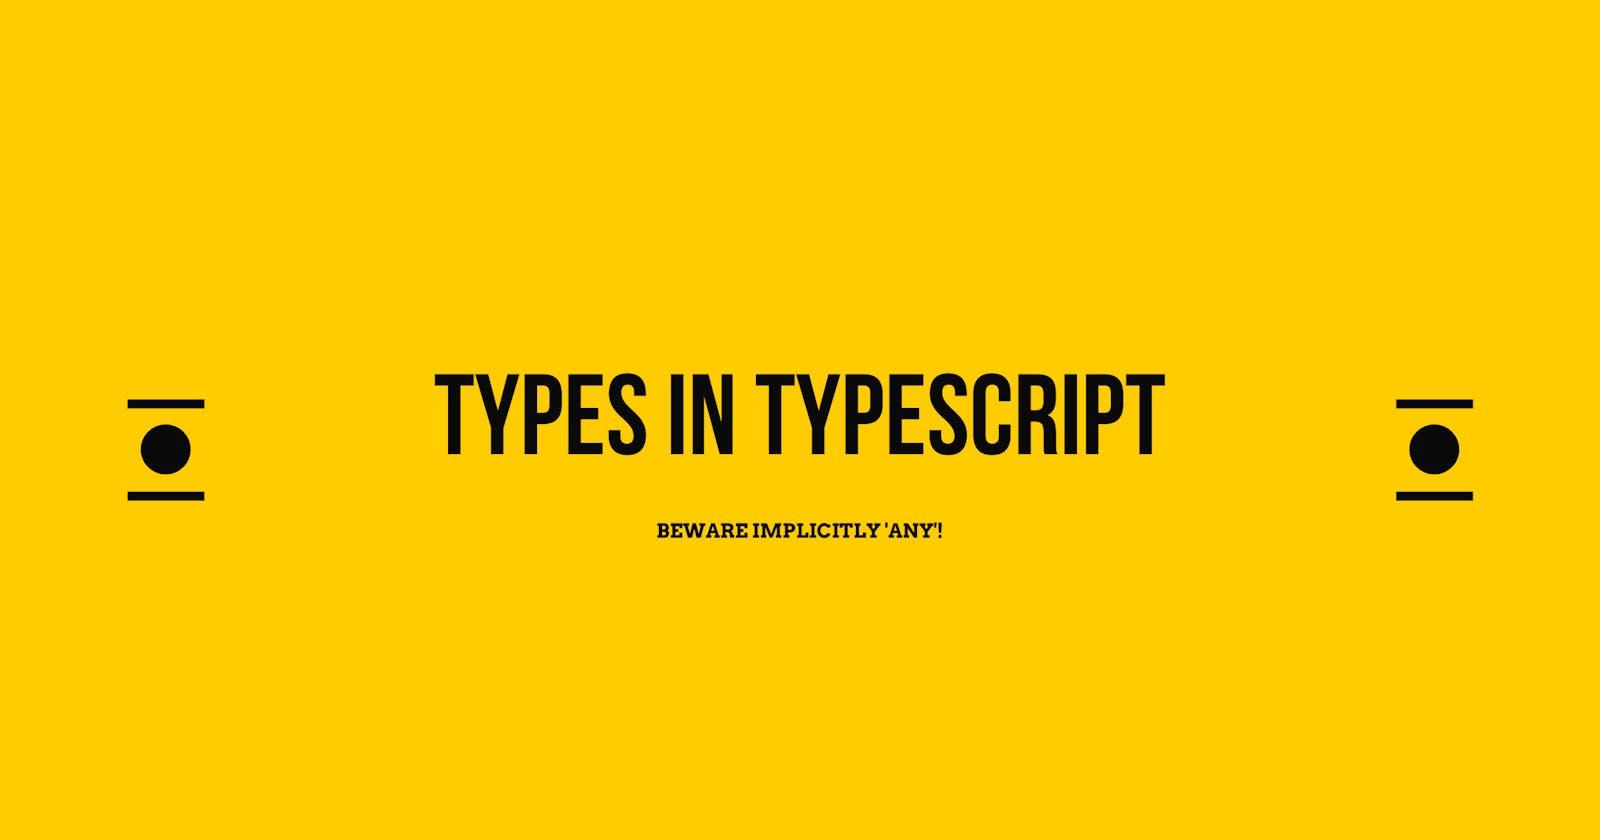 Types in TypeScript